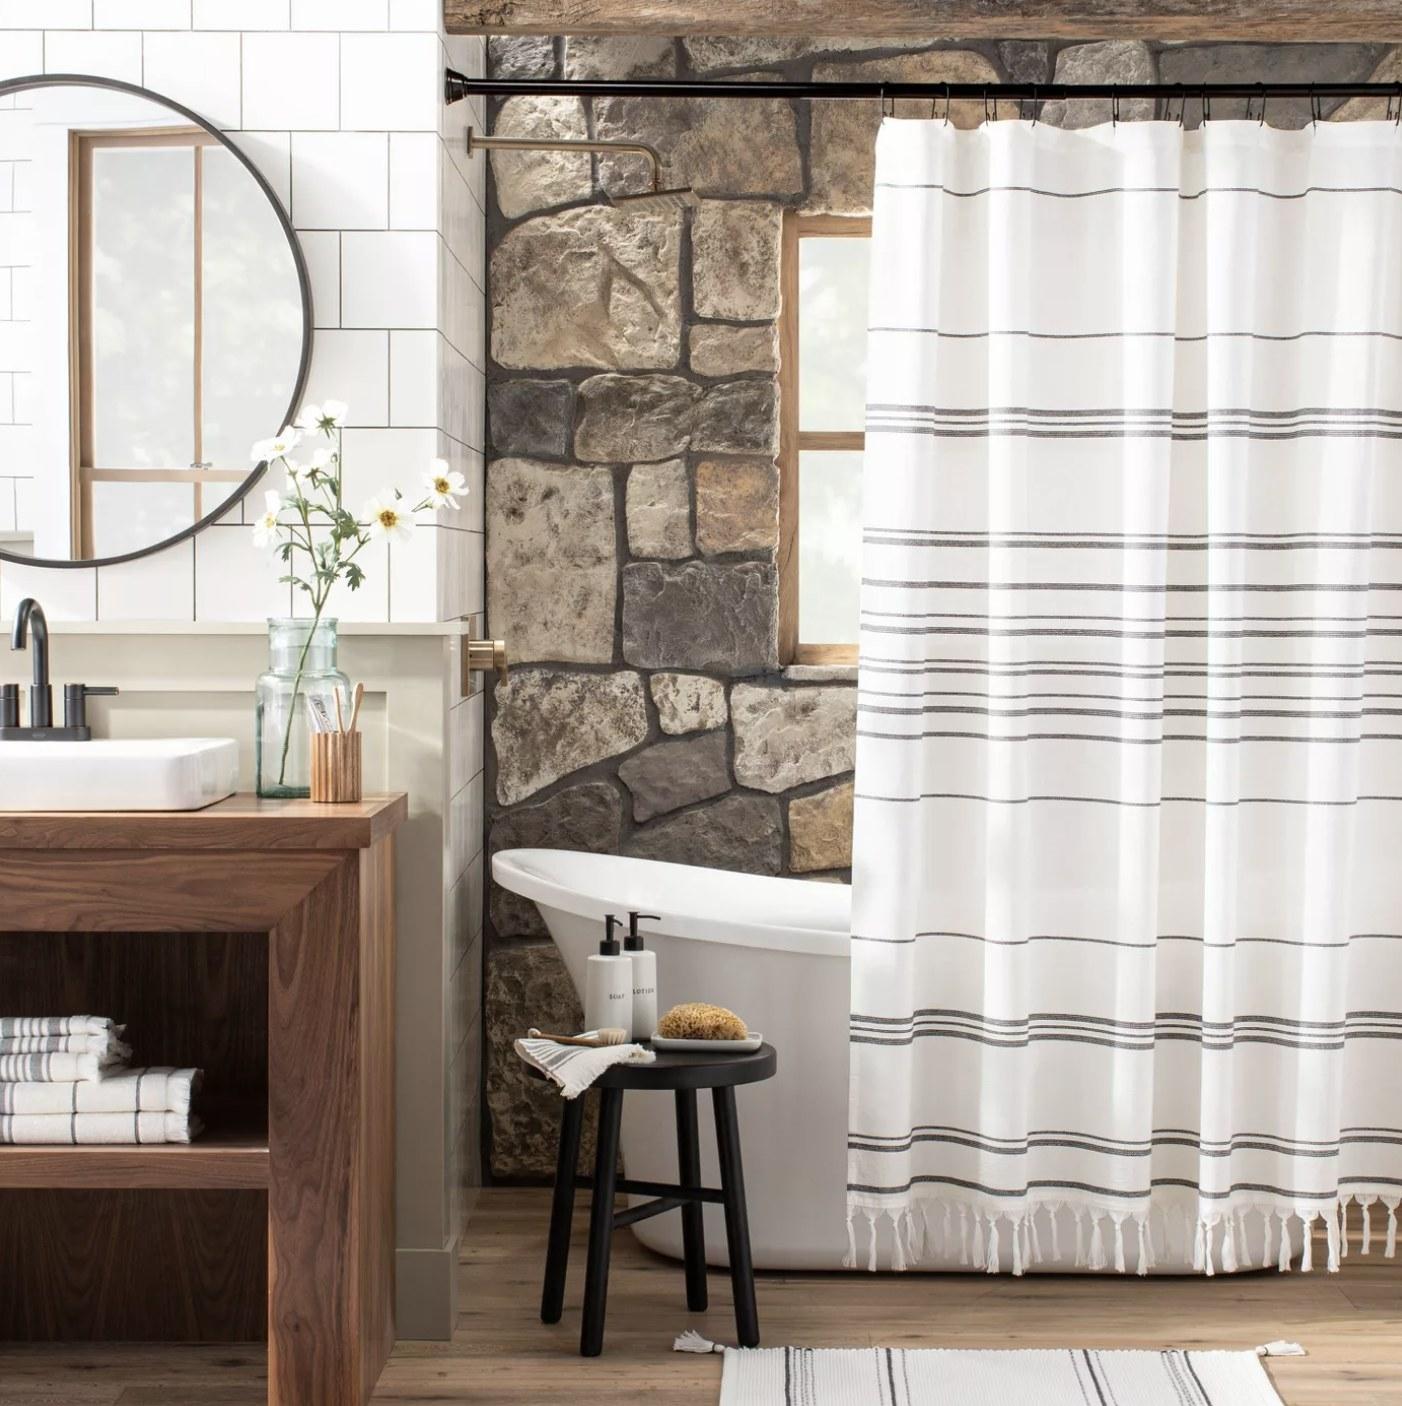 White striped shower curtain in a bathroom